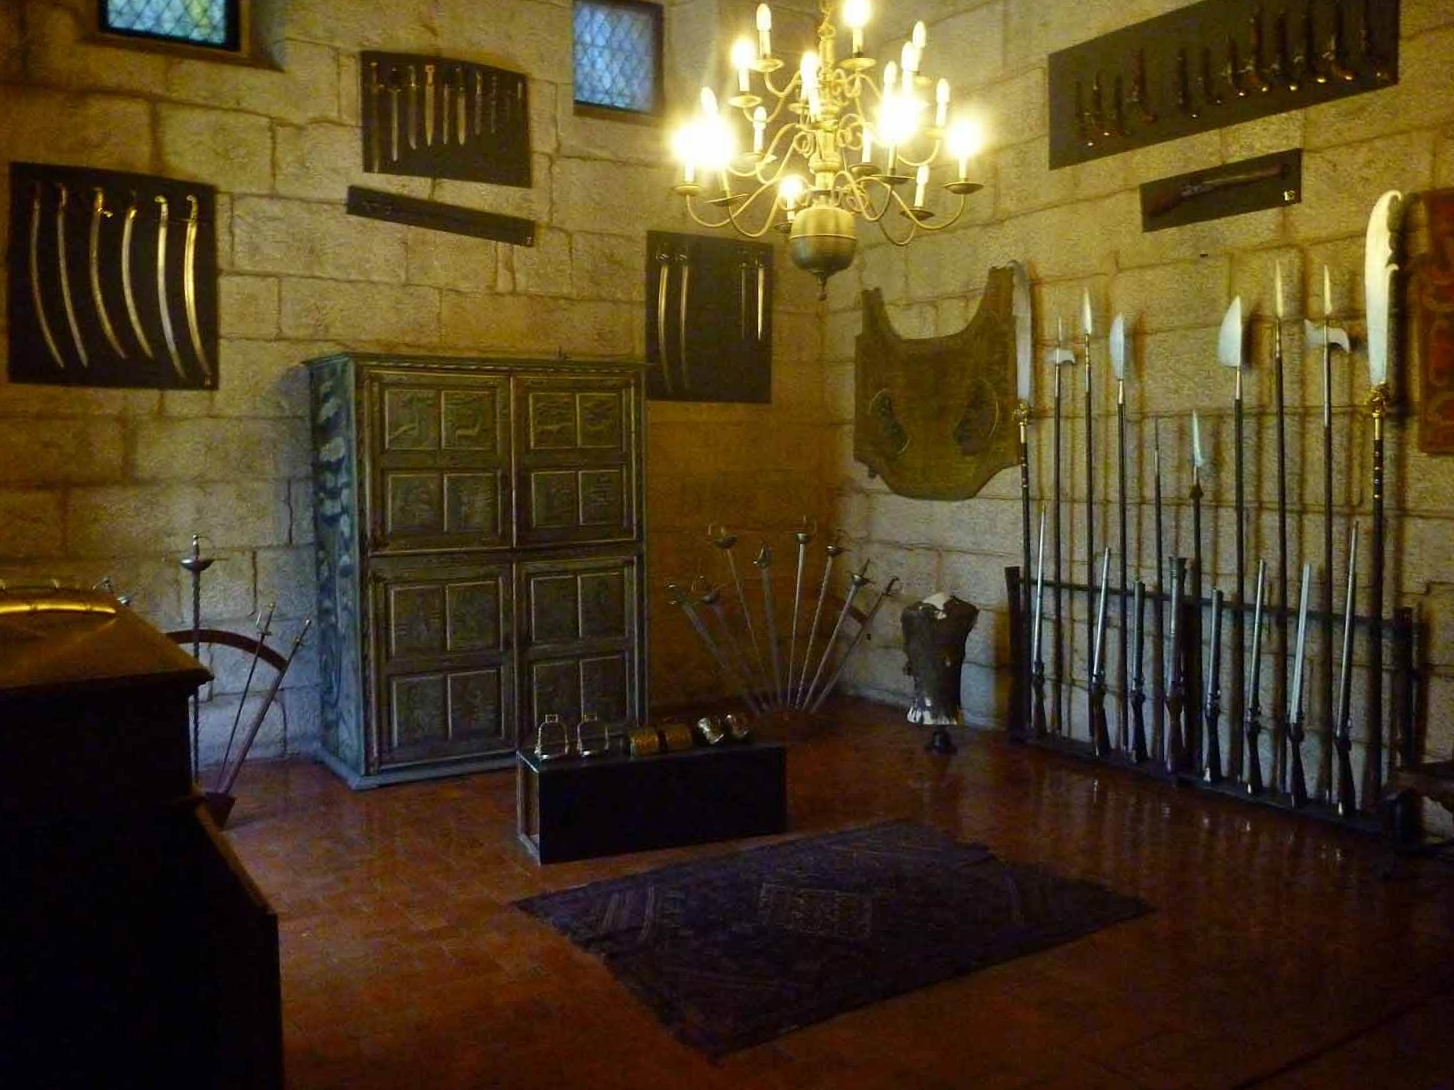 portugal-guimaraes-castle-armoury-spears.JPG